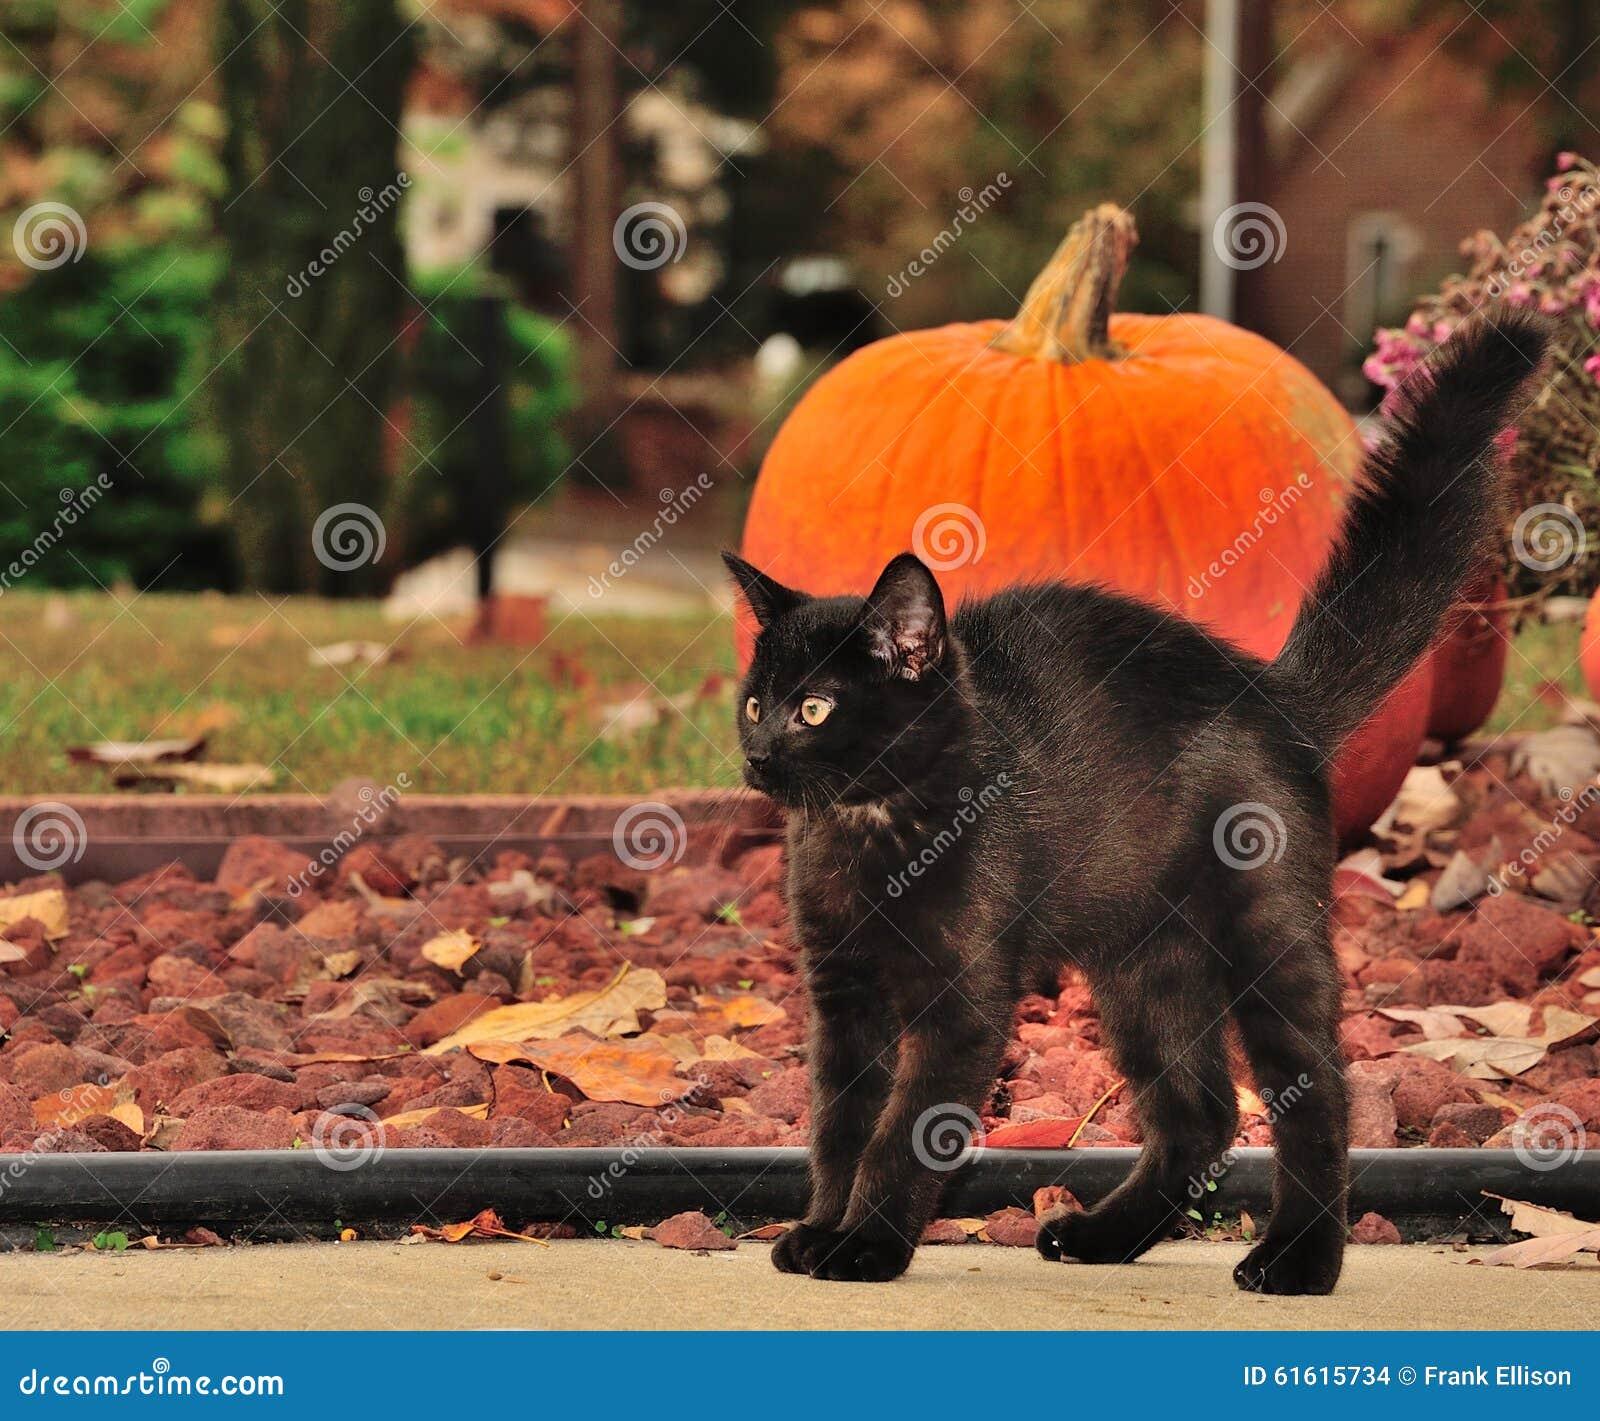 black halloween cat for autumn stock photo - image of humpback